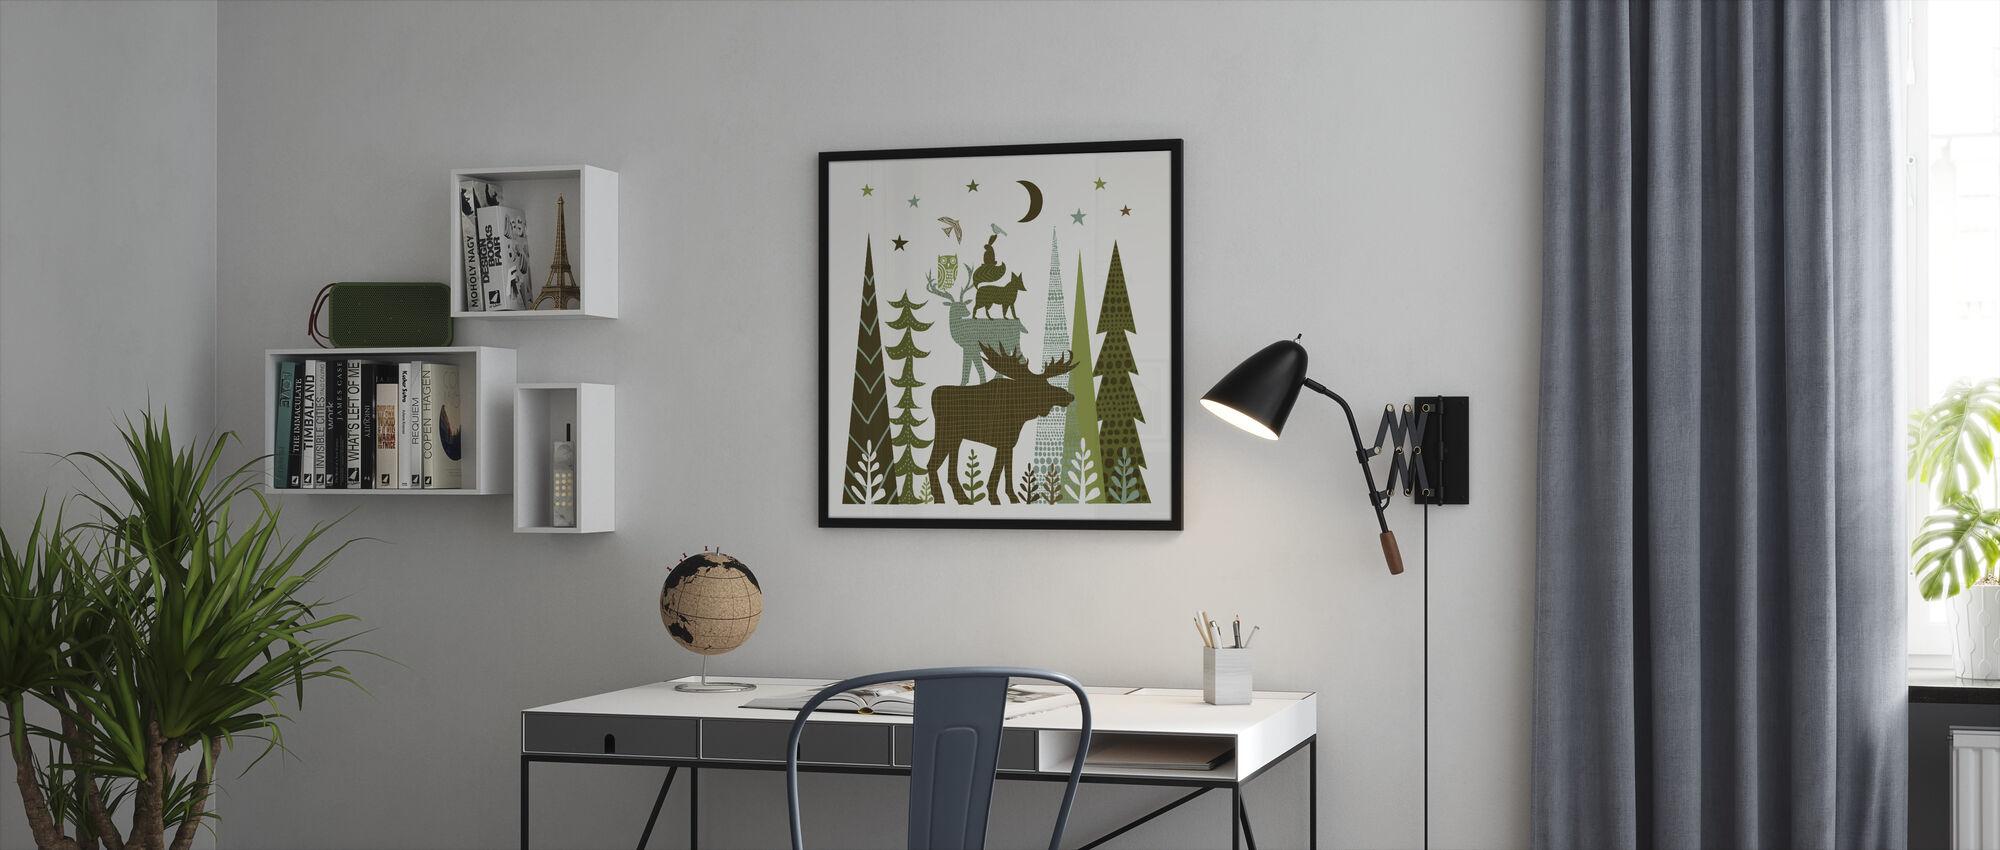 Skog Folklore Grønne Dyr 2 - Innrammet bilde - Kontor